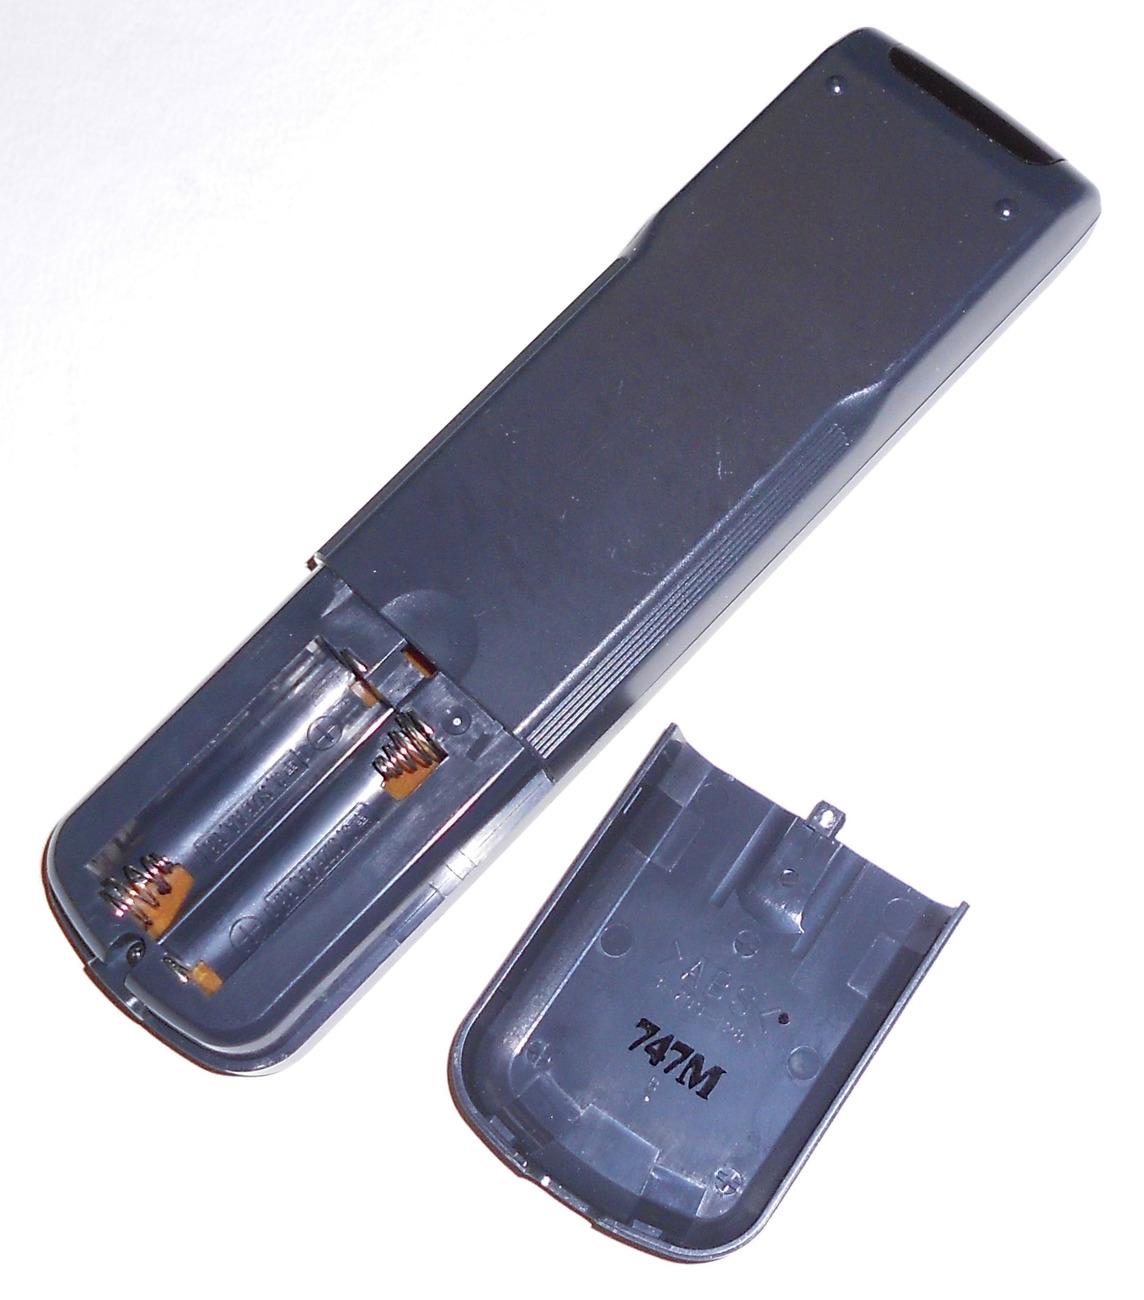 Sony RMT-V203 Video Remote Control